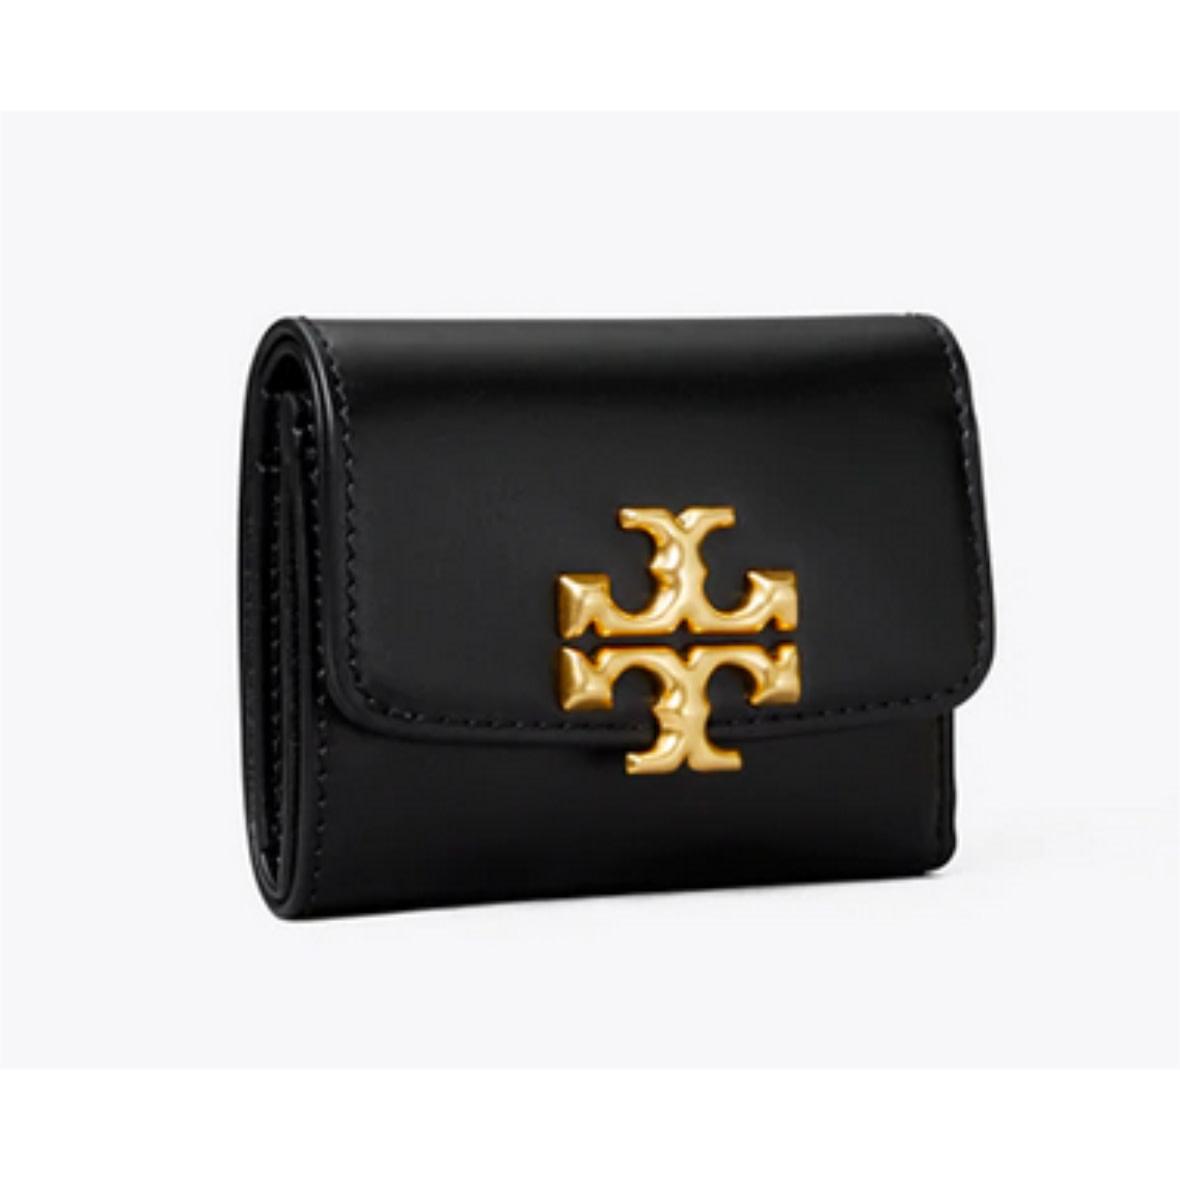 Tory Burch Tory Burch Eleanor Compact Wallet